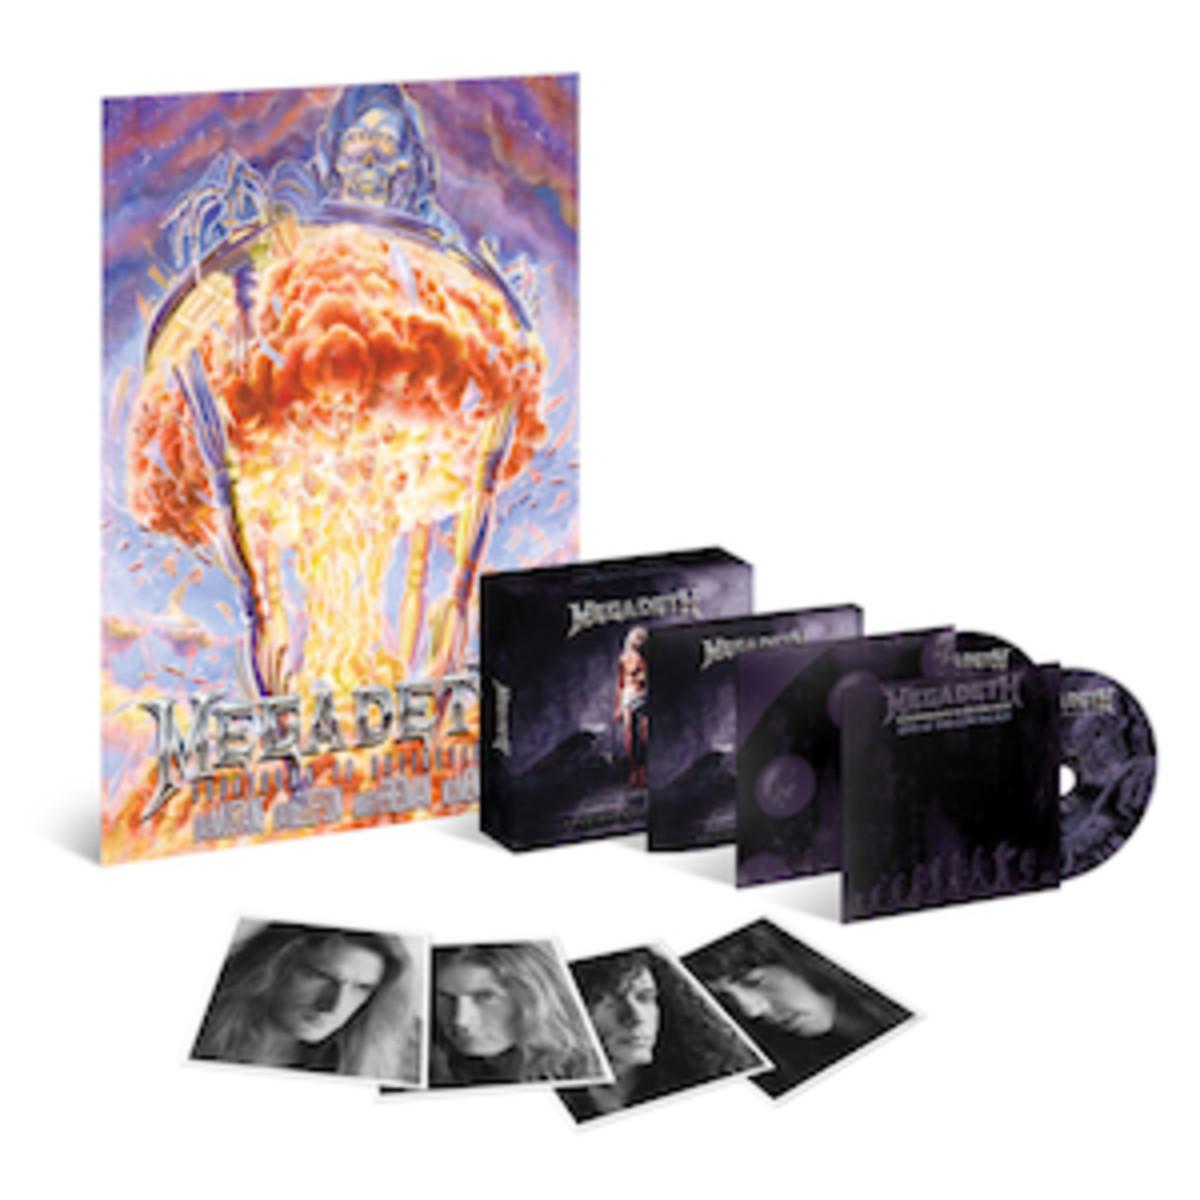 Megadeth+Extinction+Box